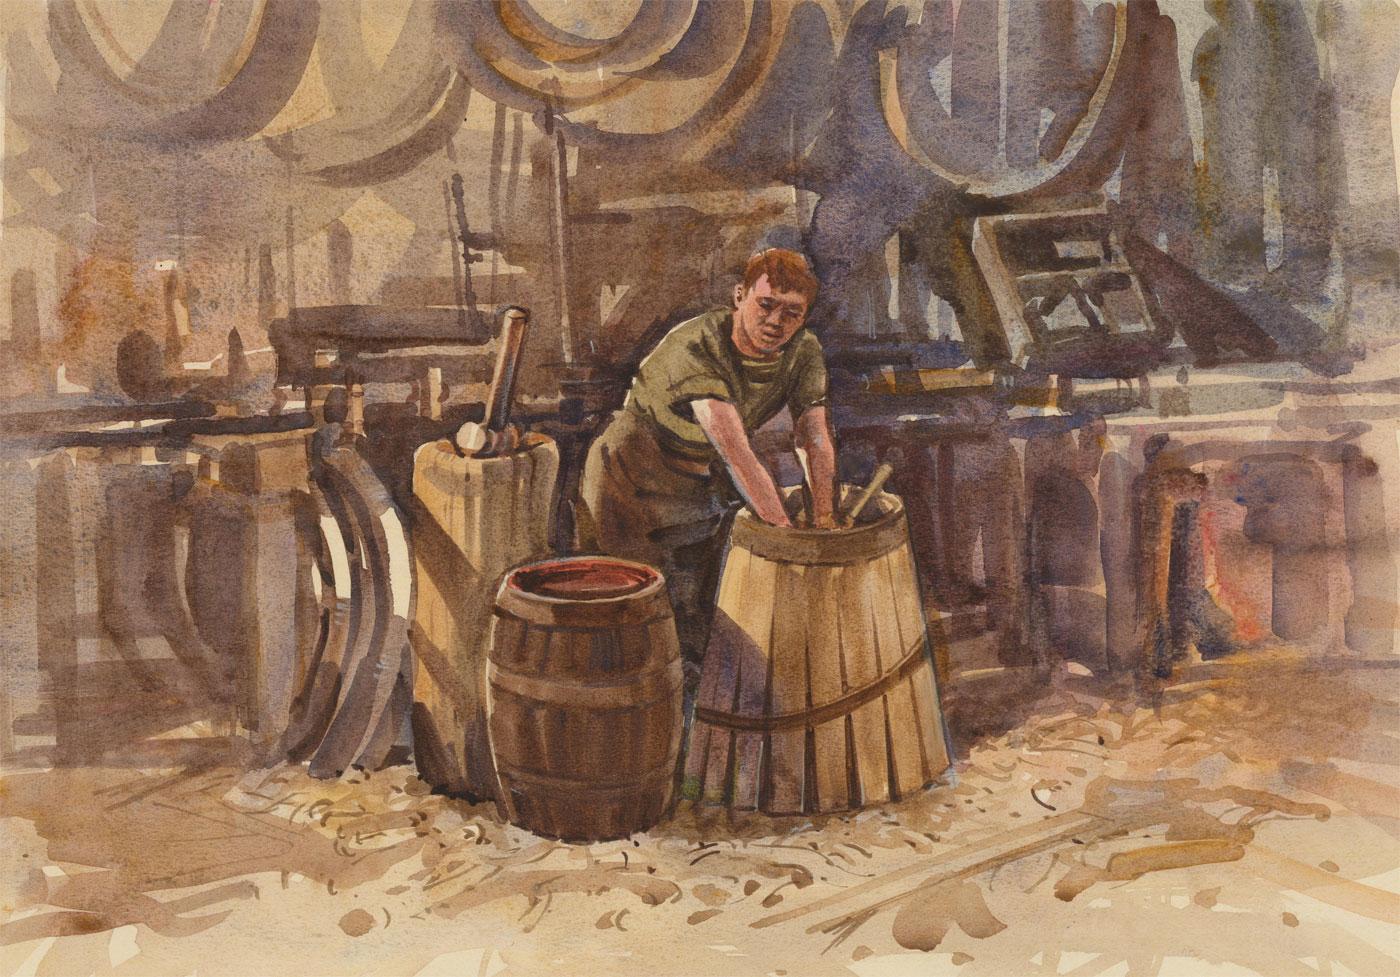 Clifford H. Thompson (1926-2017) - 1996 Watercolour, The Blacksmith